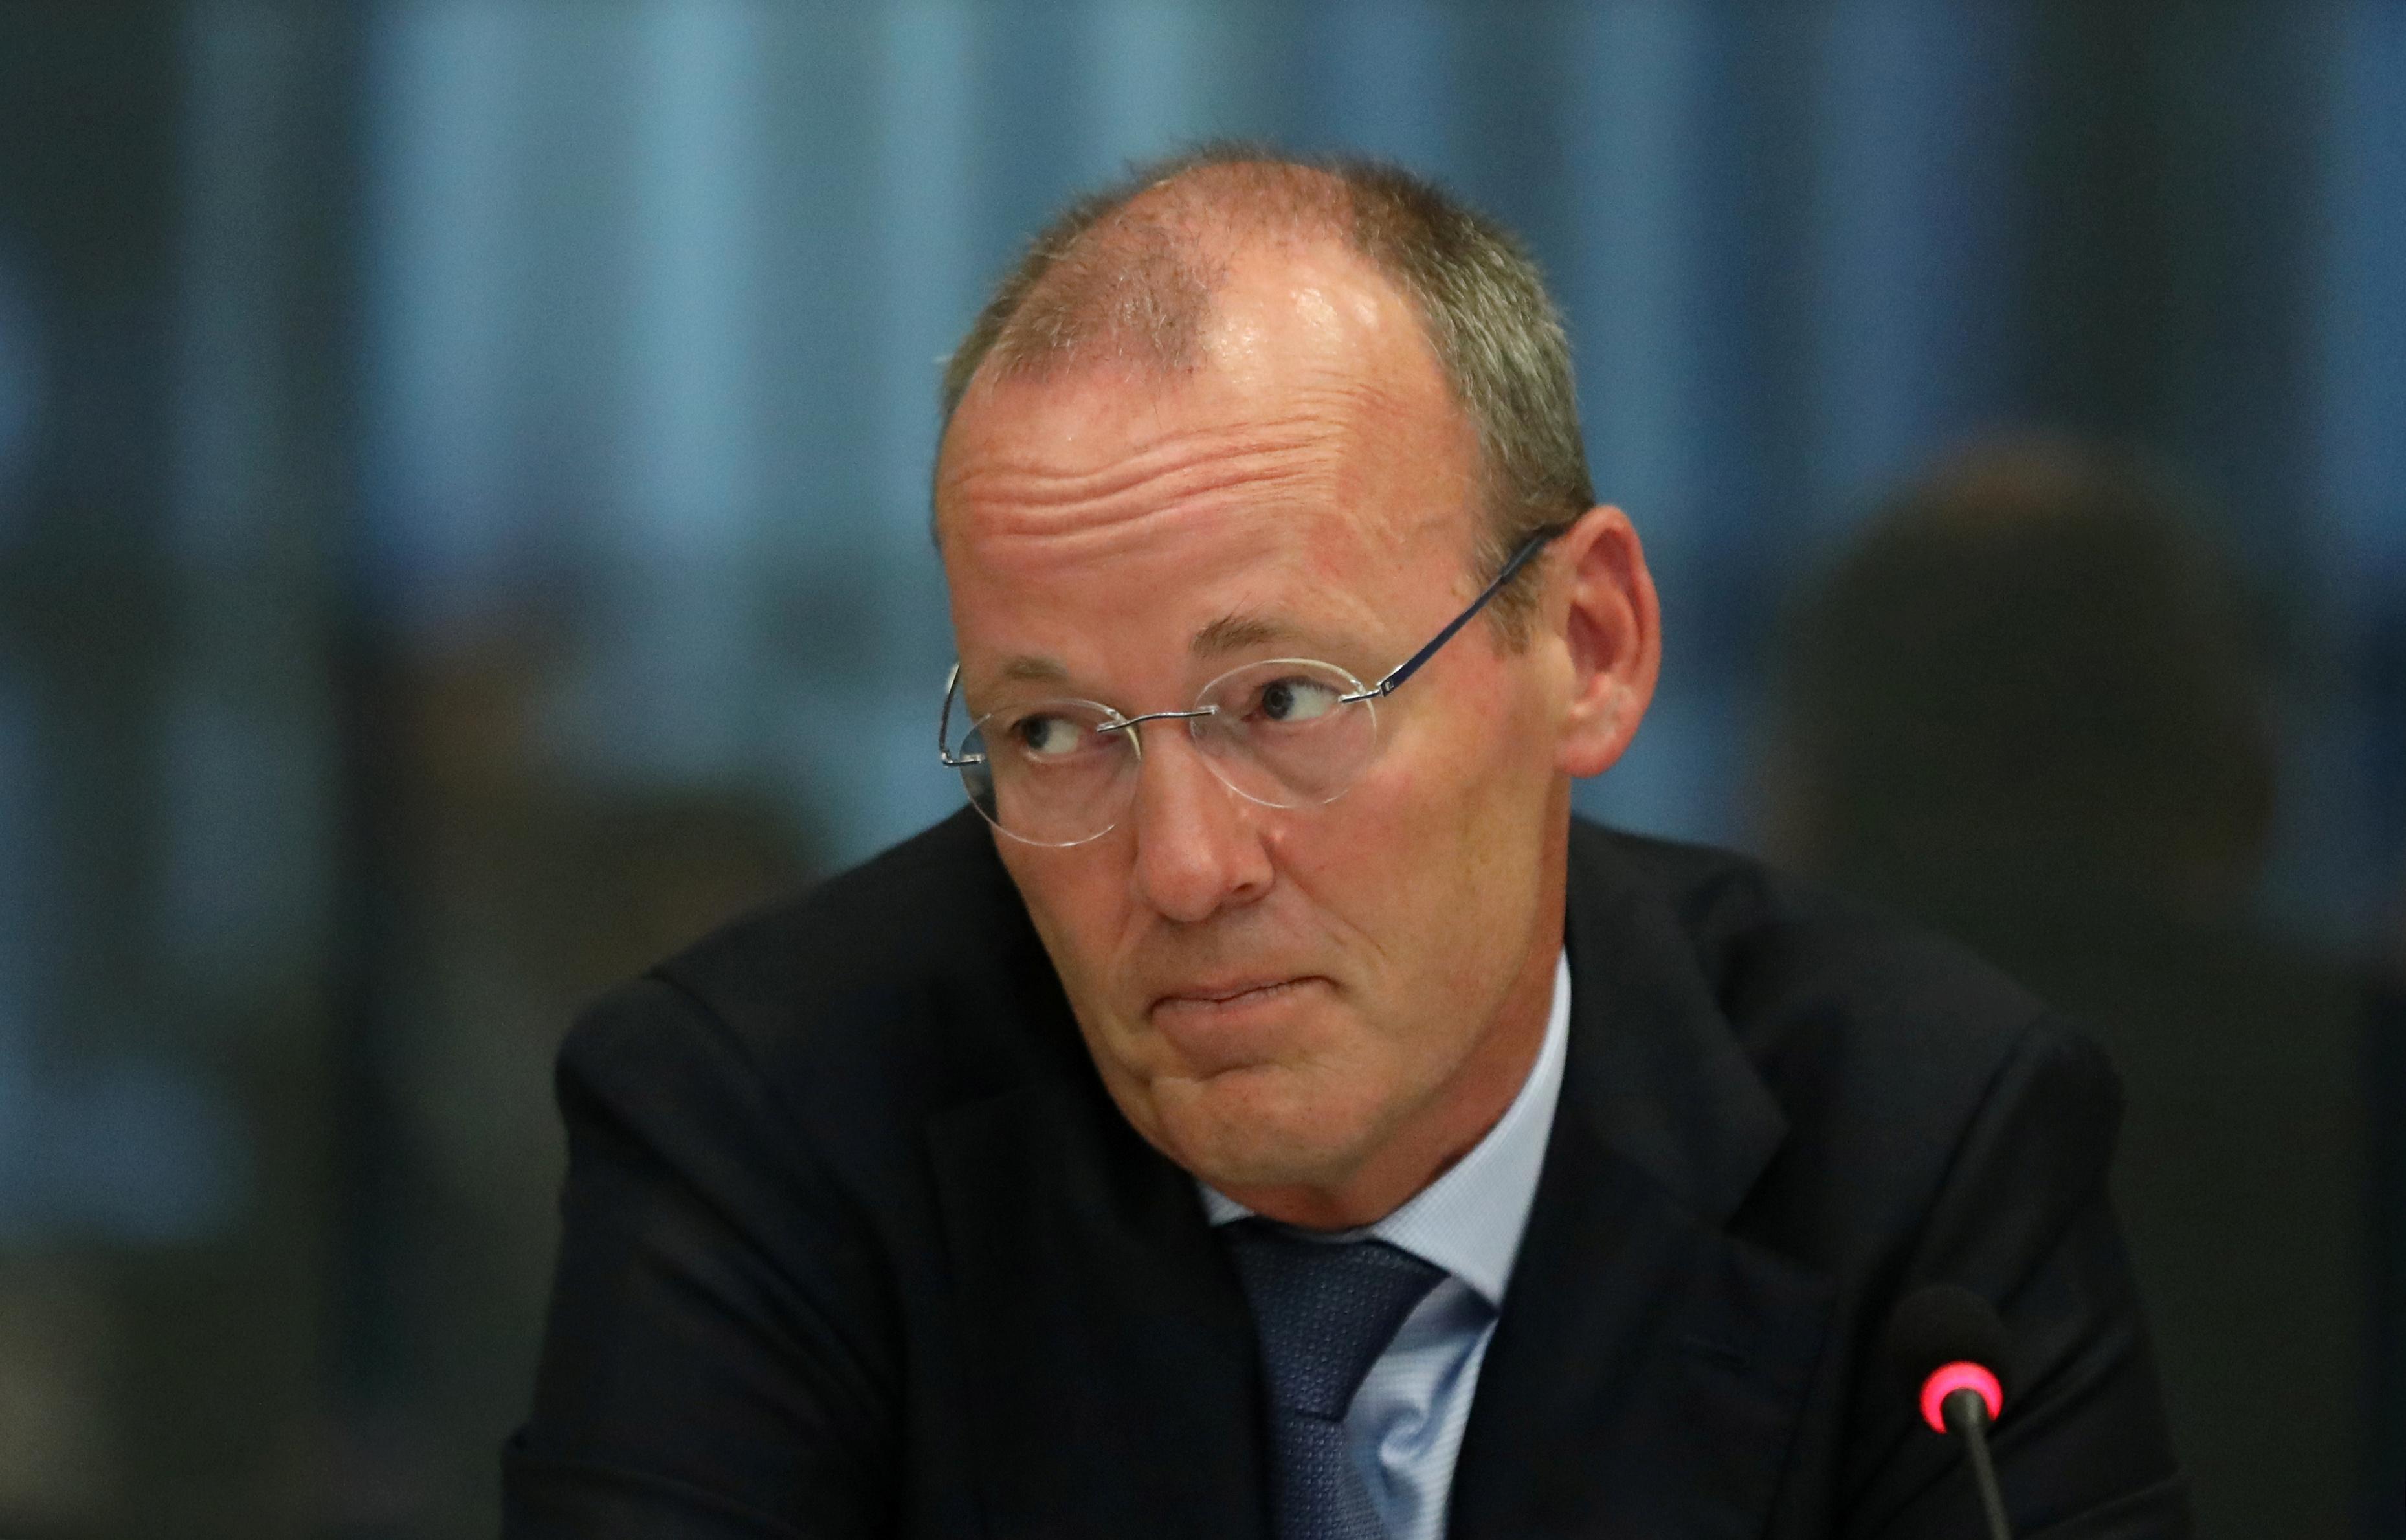 ECB's Knot, Rehn speak in favor of simple 2% inflation target